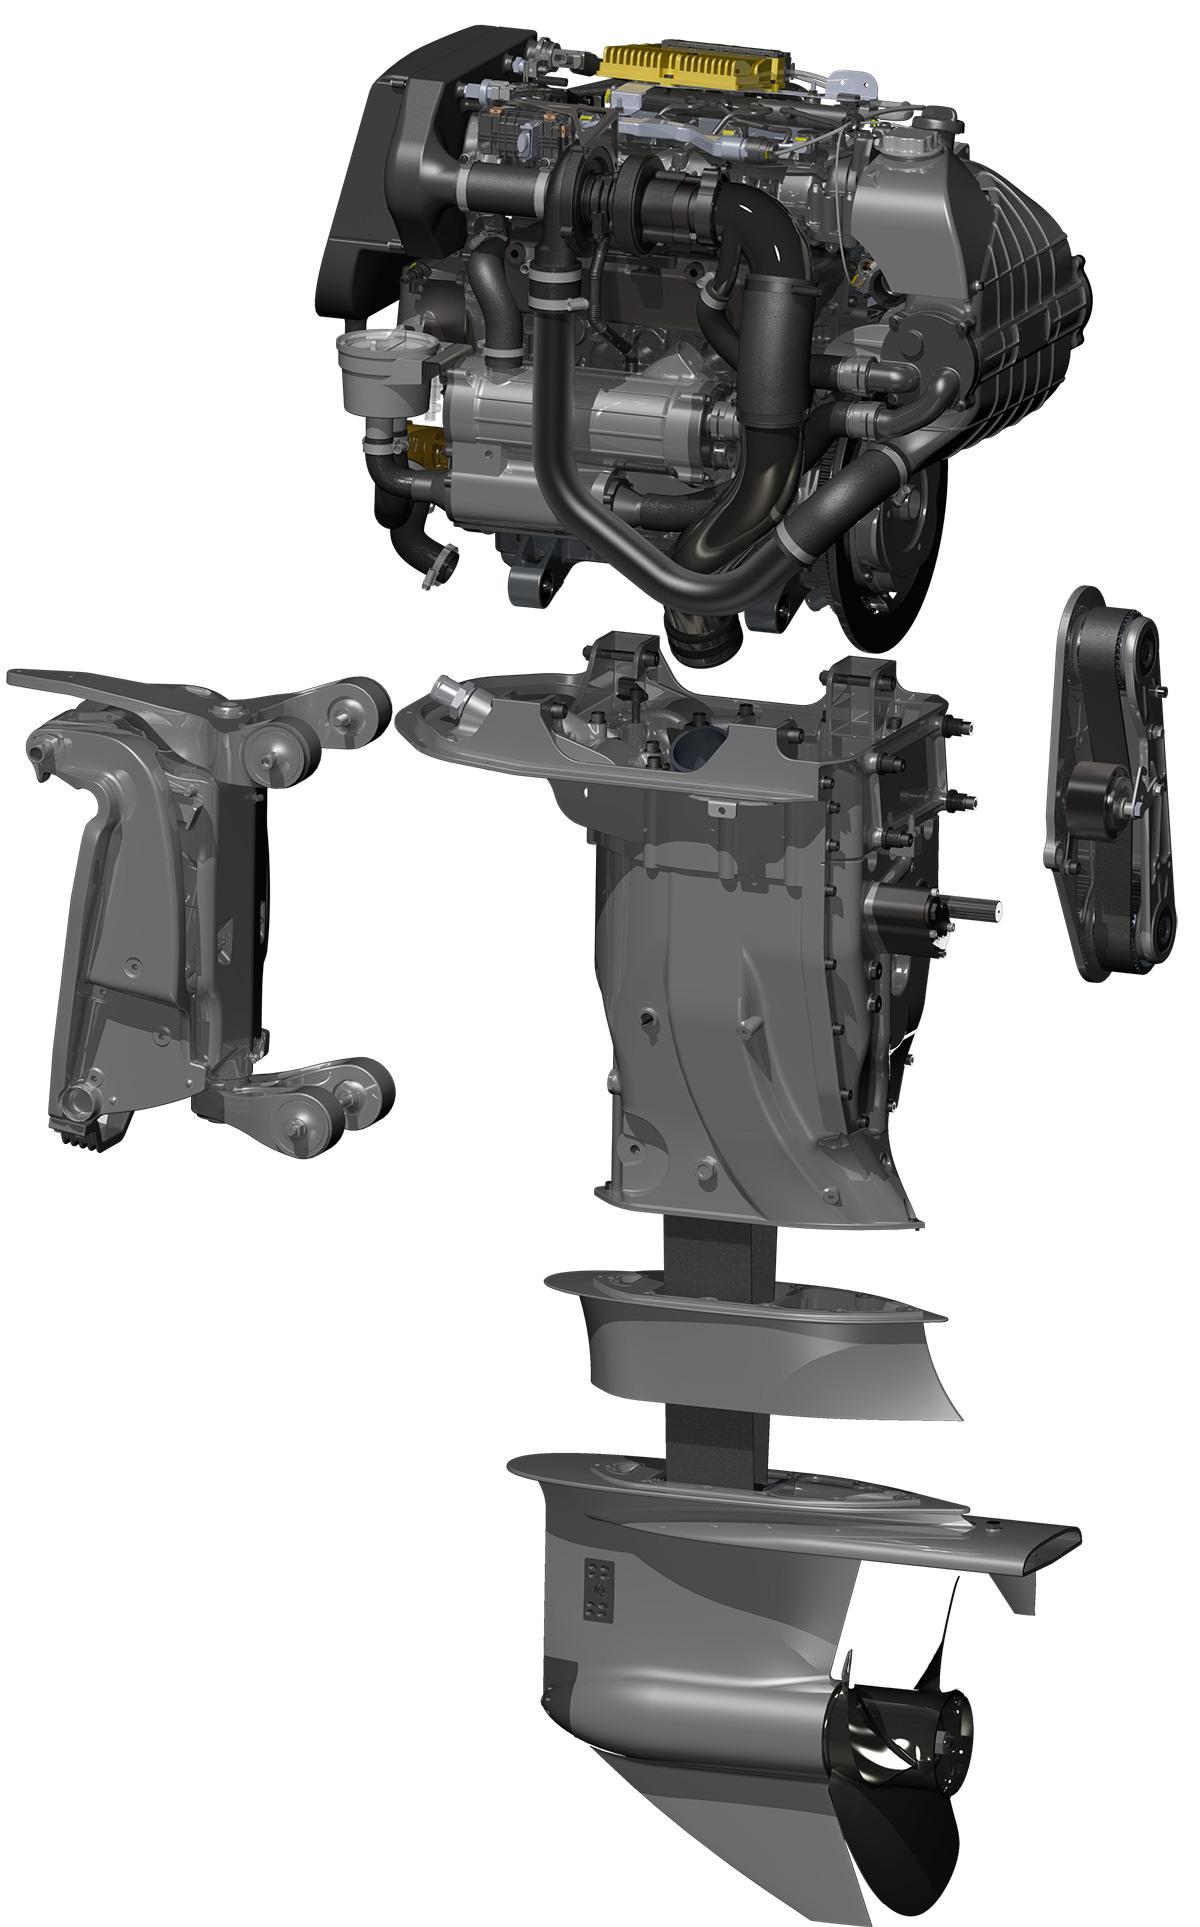 Diesel Outboard Motor : Oxe hp diesel outboard engine tested motor boat